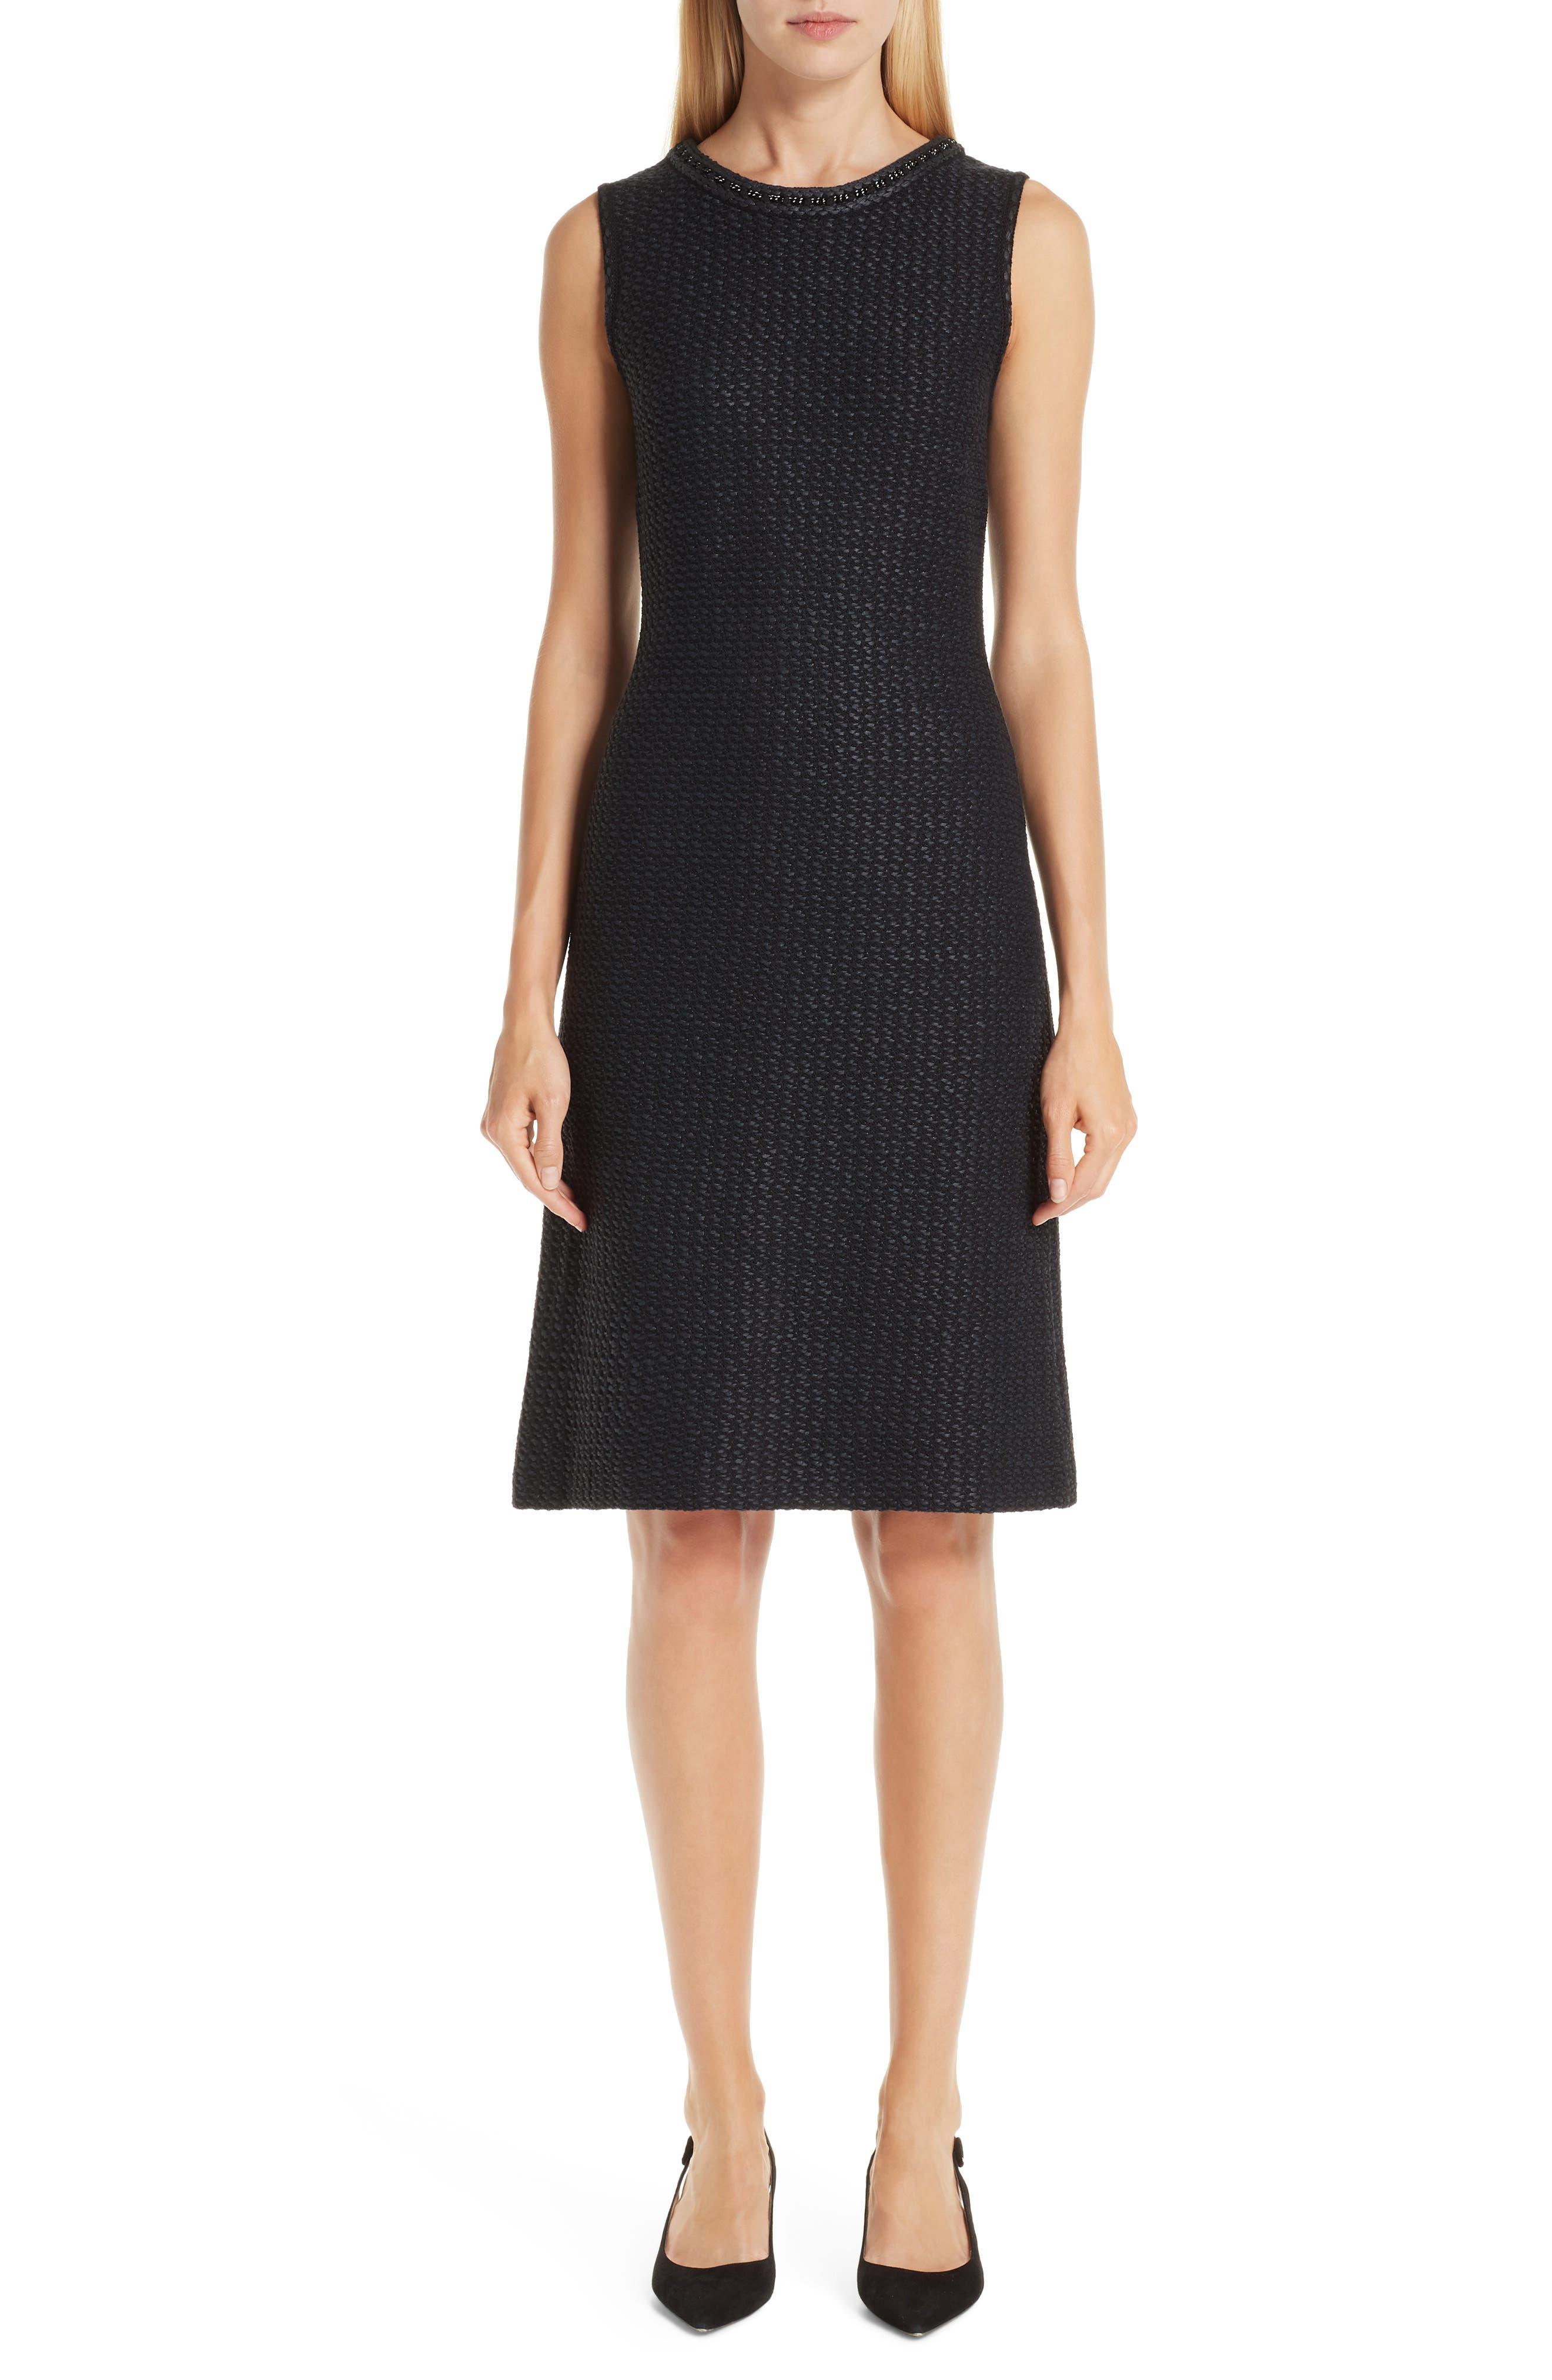 ST. JOHN COLLECTION, Adina Chain Trim Knit Dress, Main thumbnail 1, color, CAVIAR